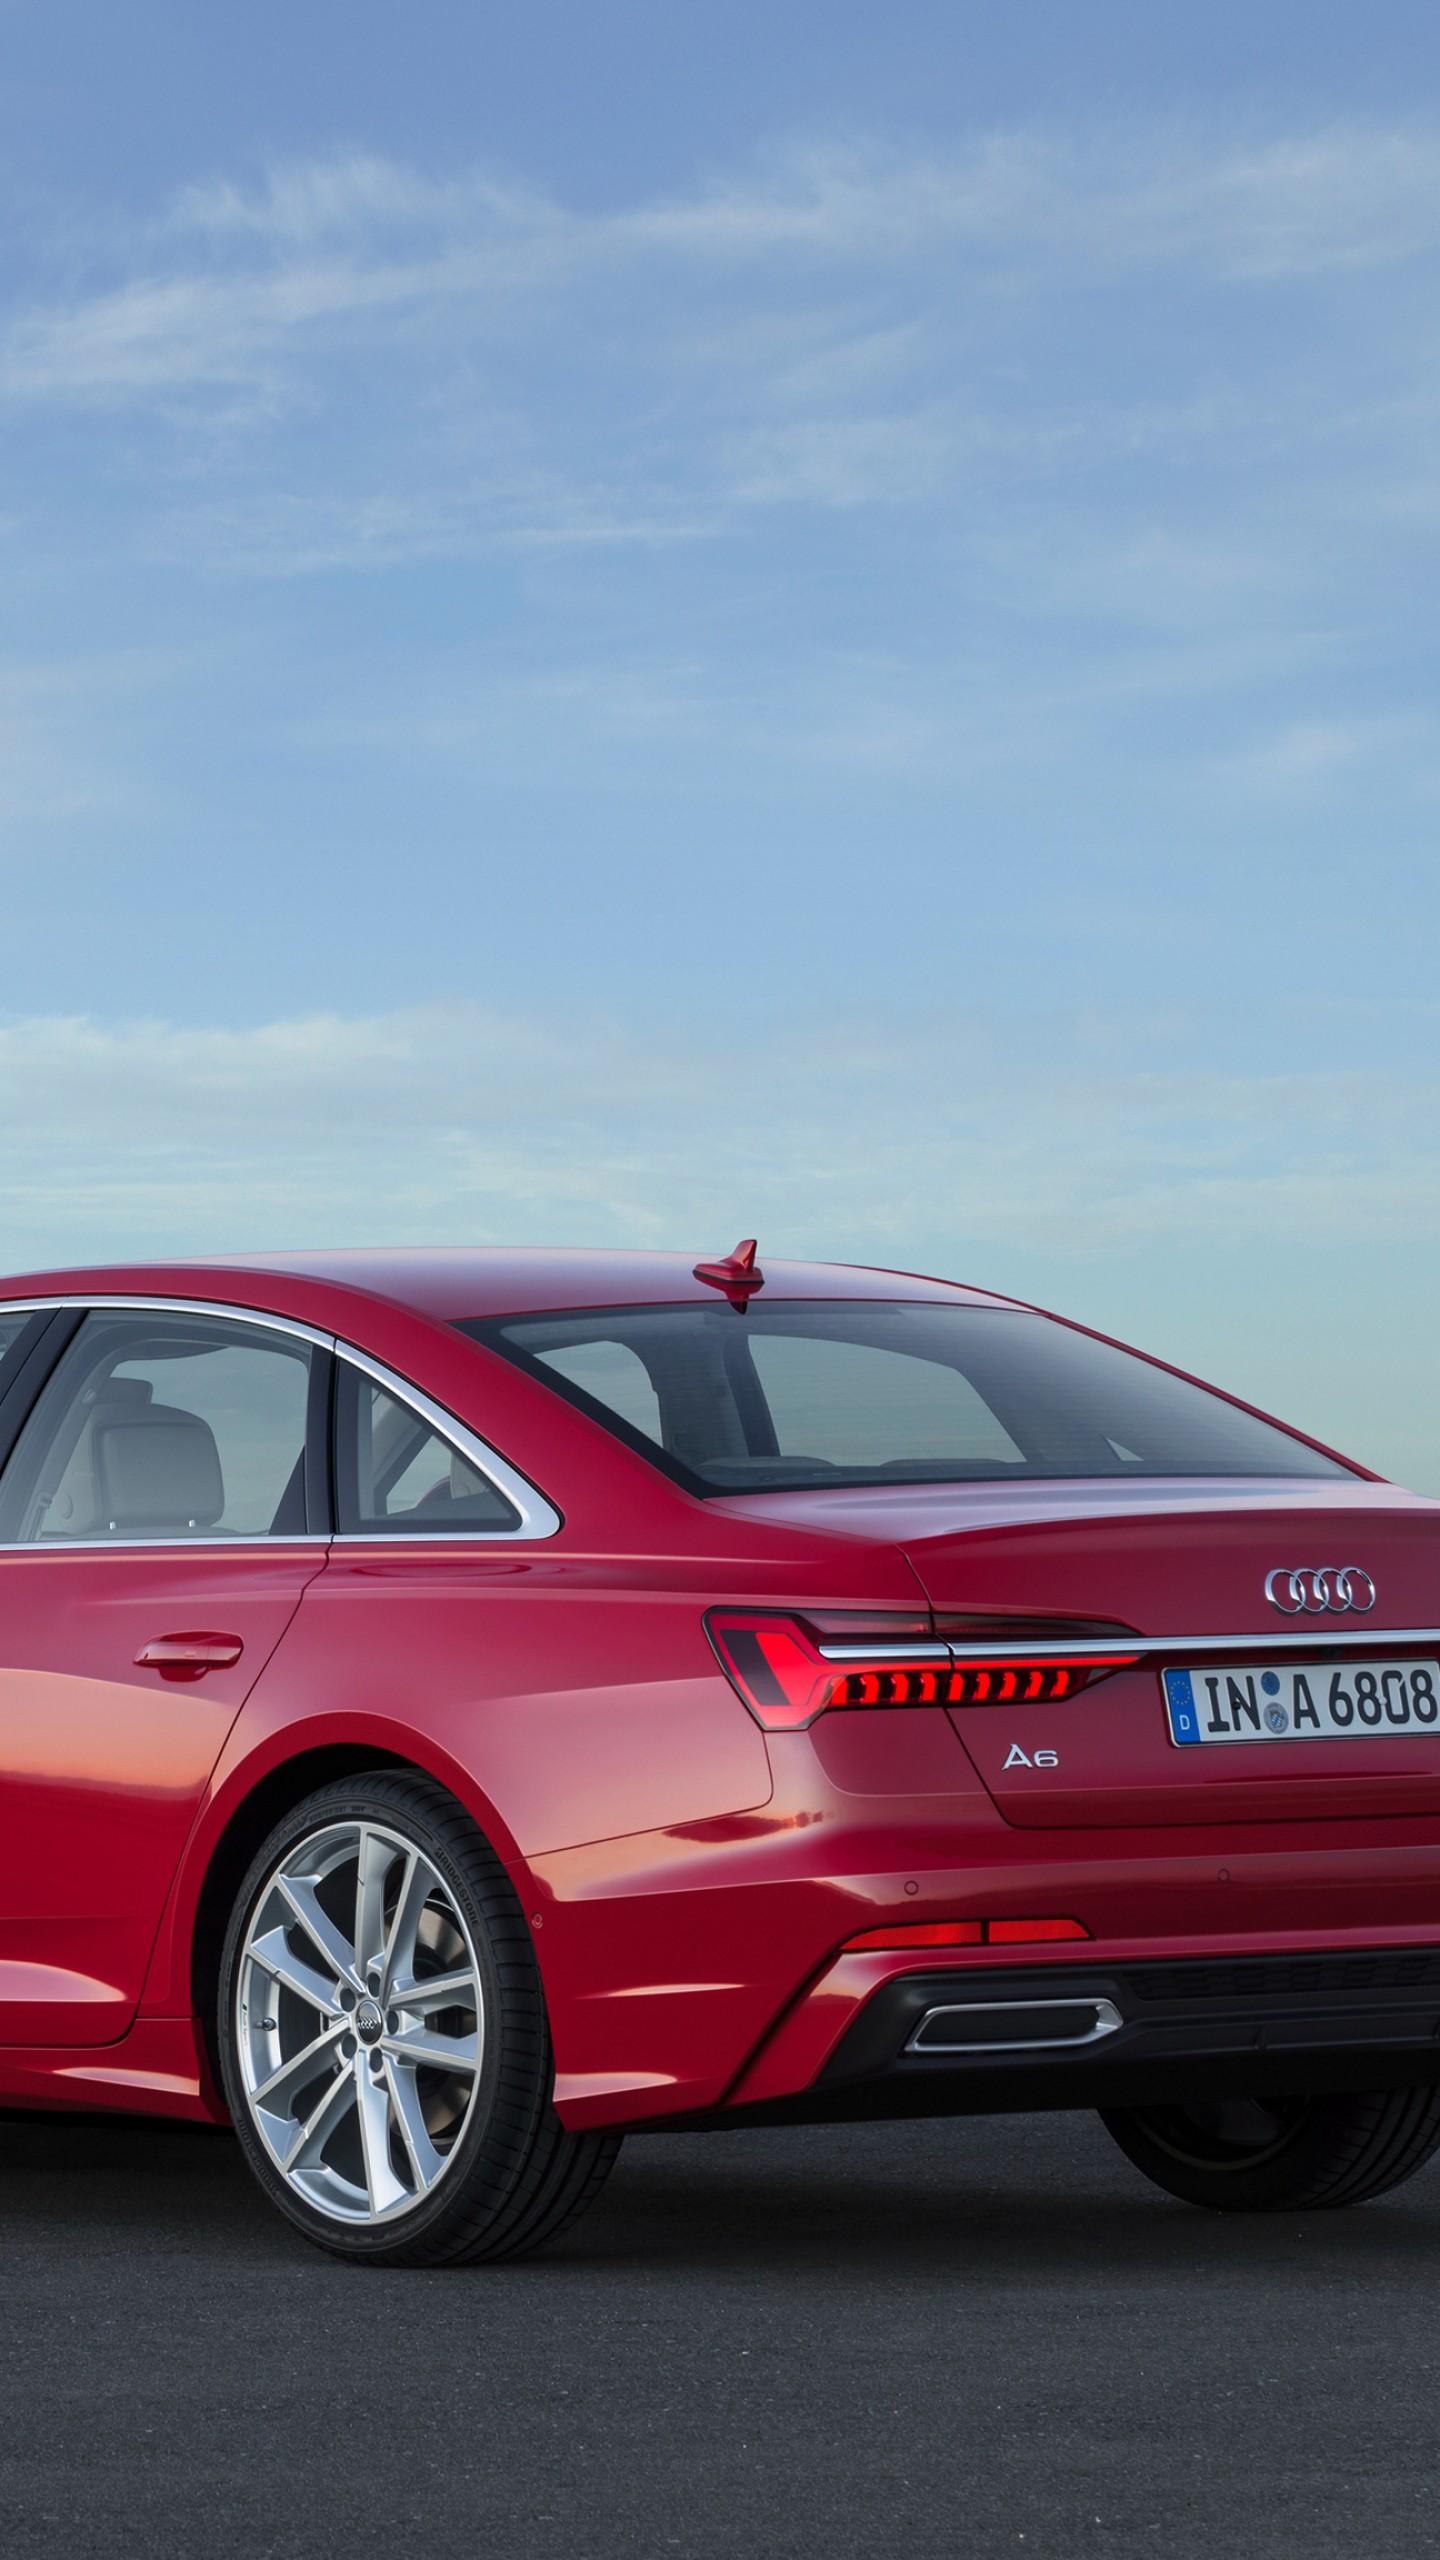 2016 Audi A6 3 0t Interior: Wallpaper Audi A6, 2018 Cars, 4k, Cars & Bikes #17586